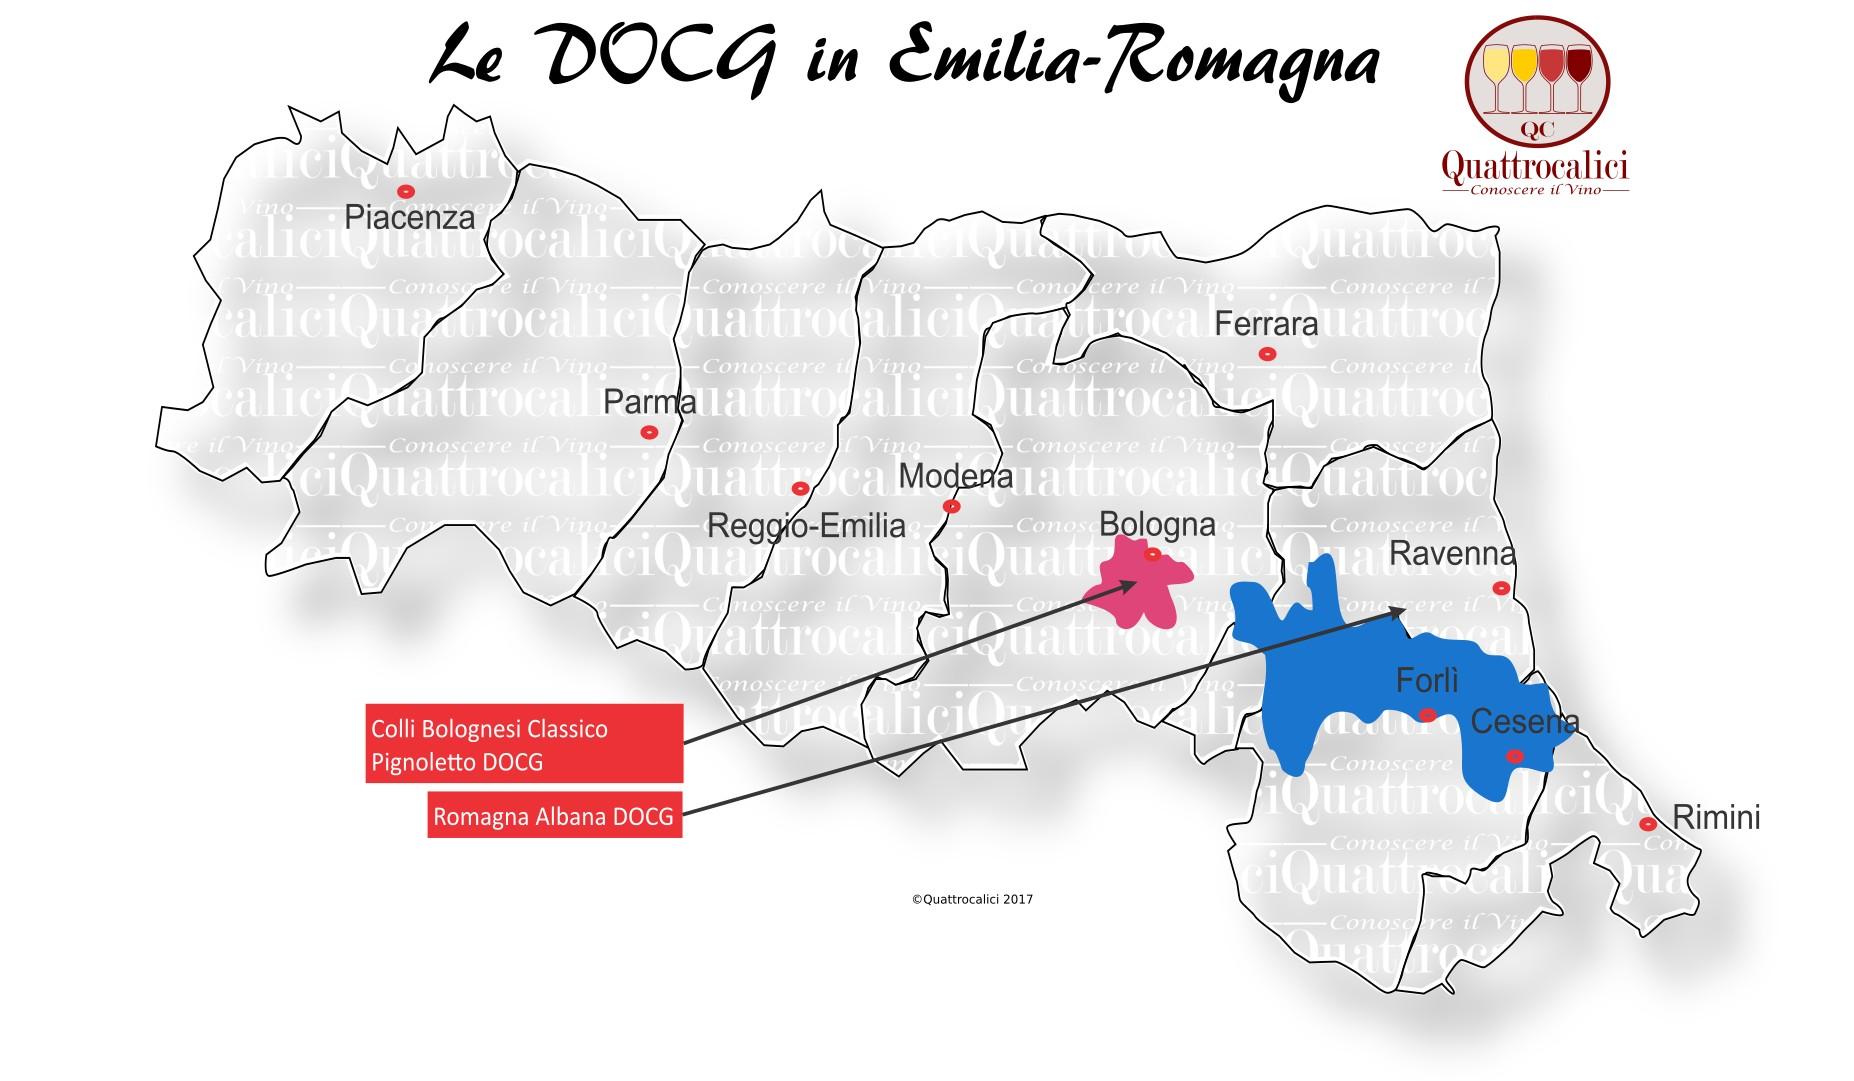 Le DOCG in Emilia-Romagna